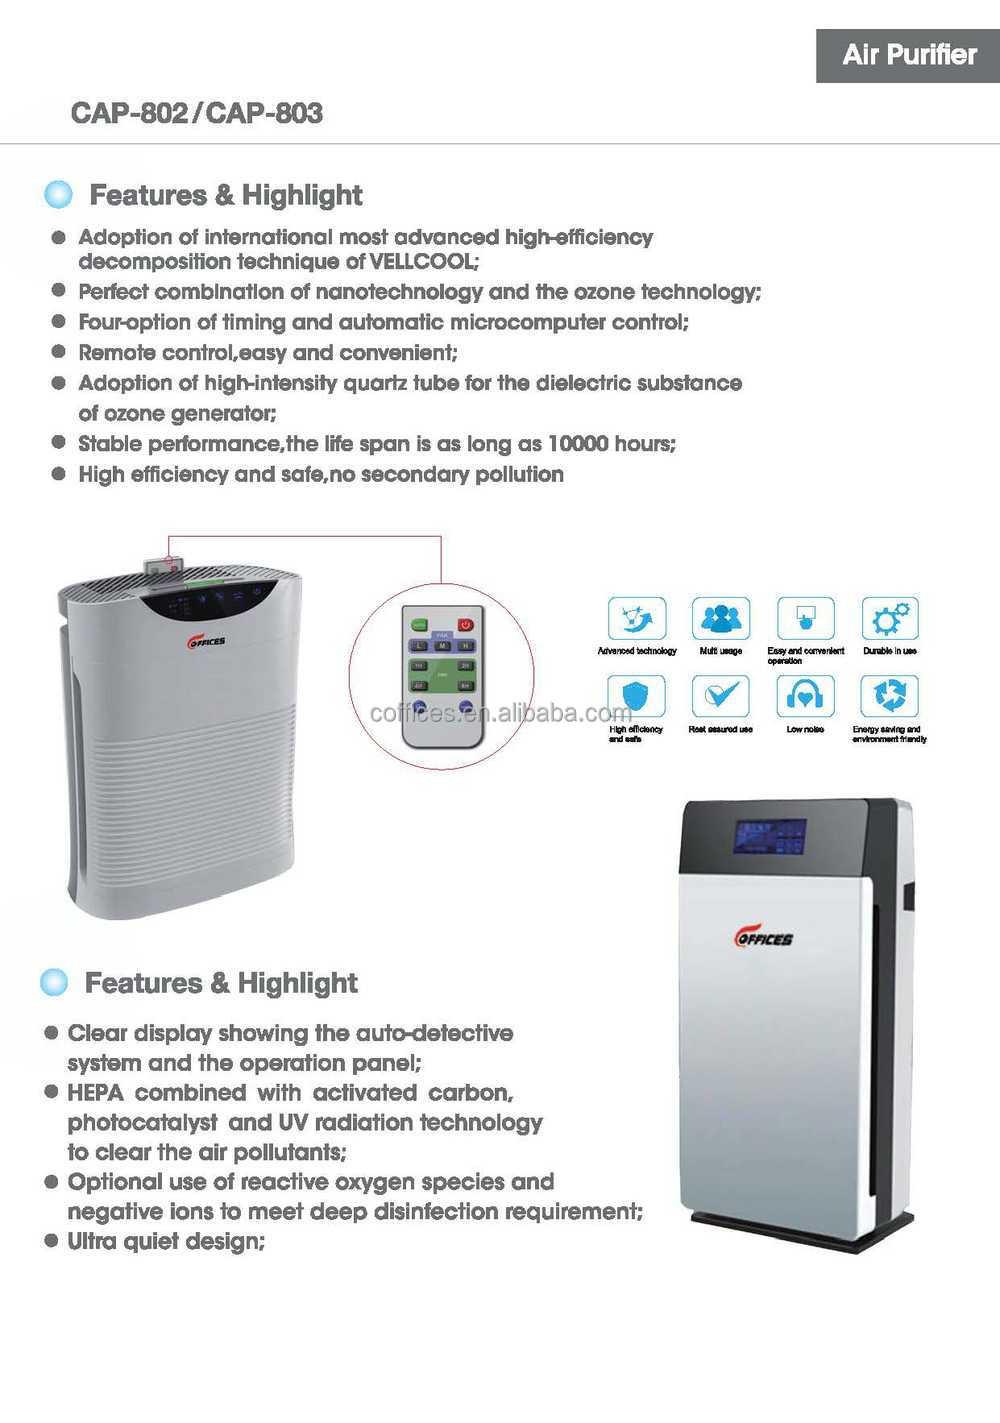 Electrostatic Hepa Uv Photocatalyst Pm2.5 Filter Air Purifier ...